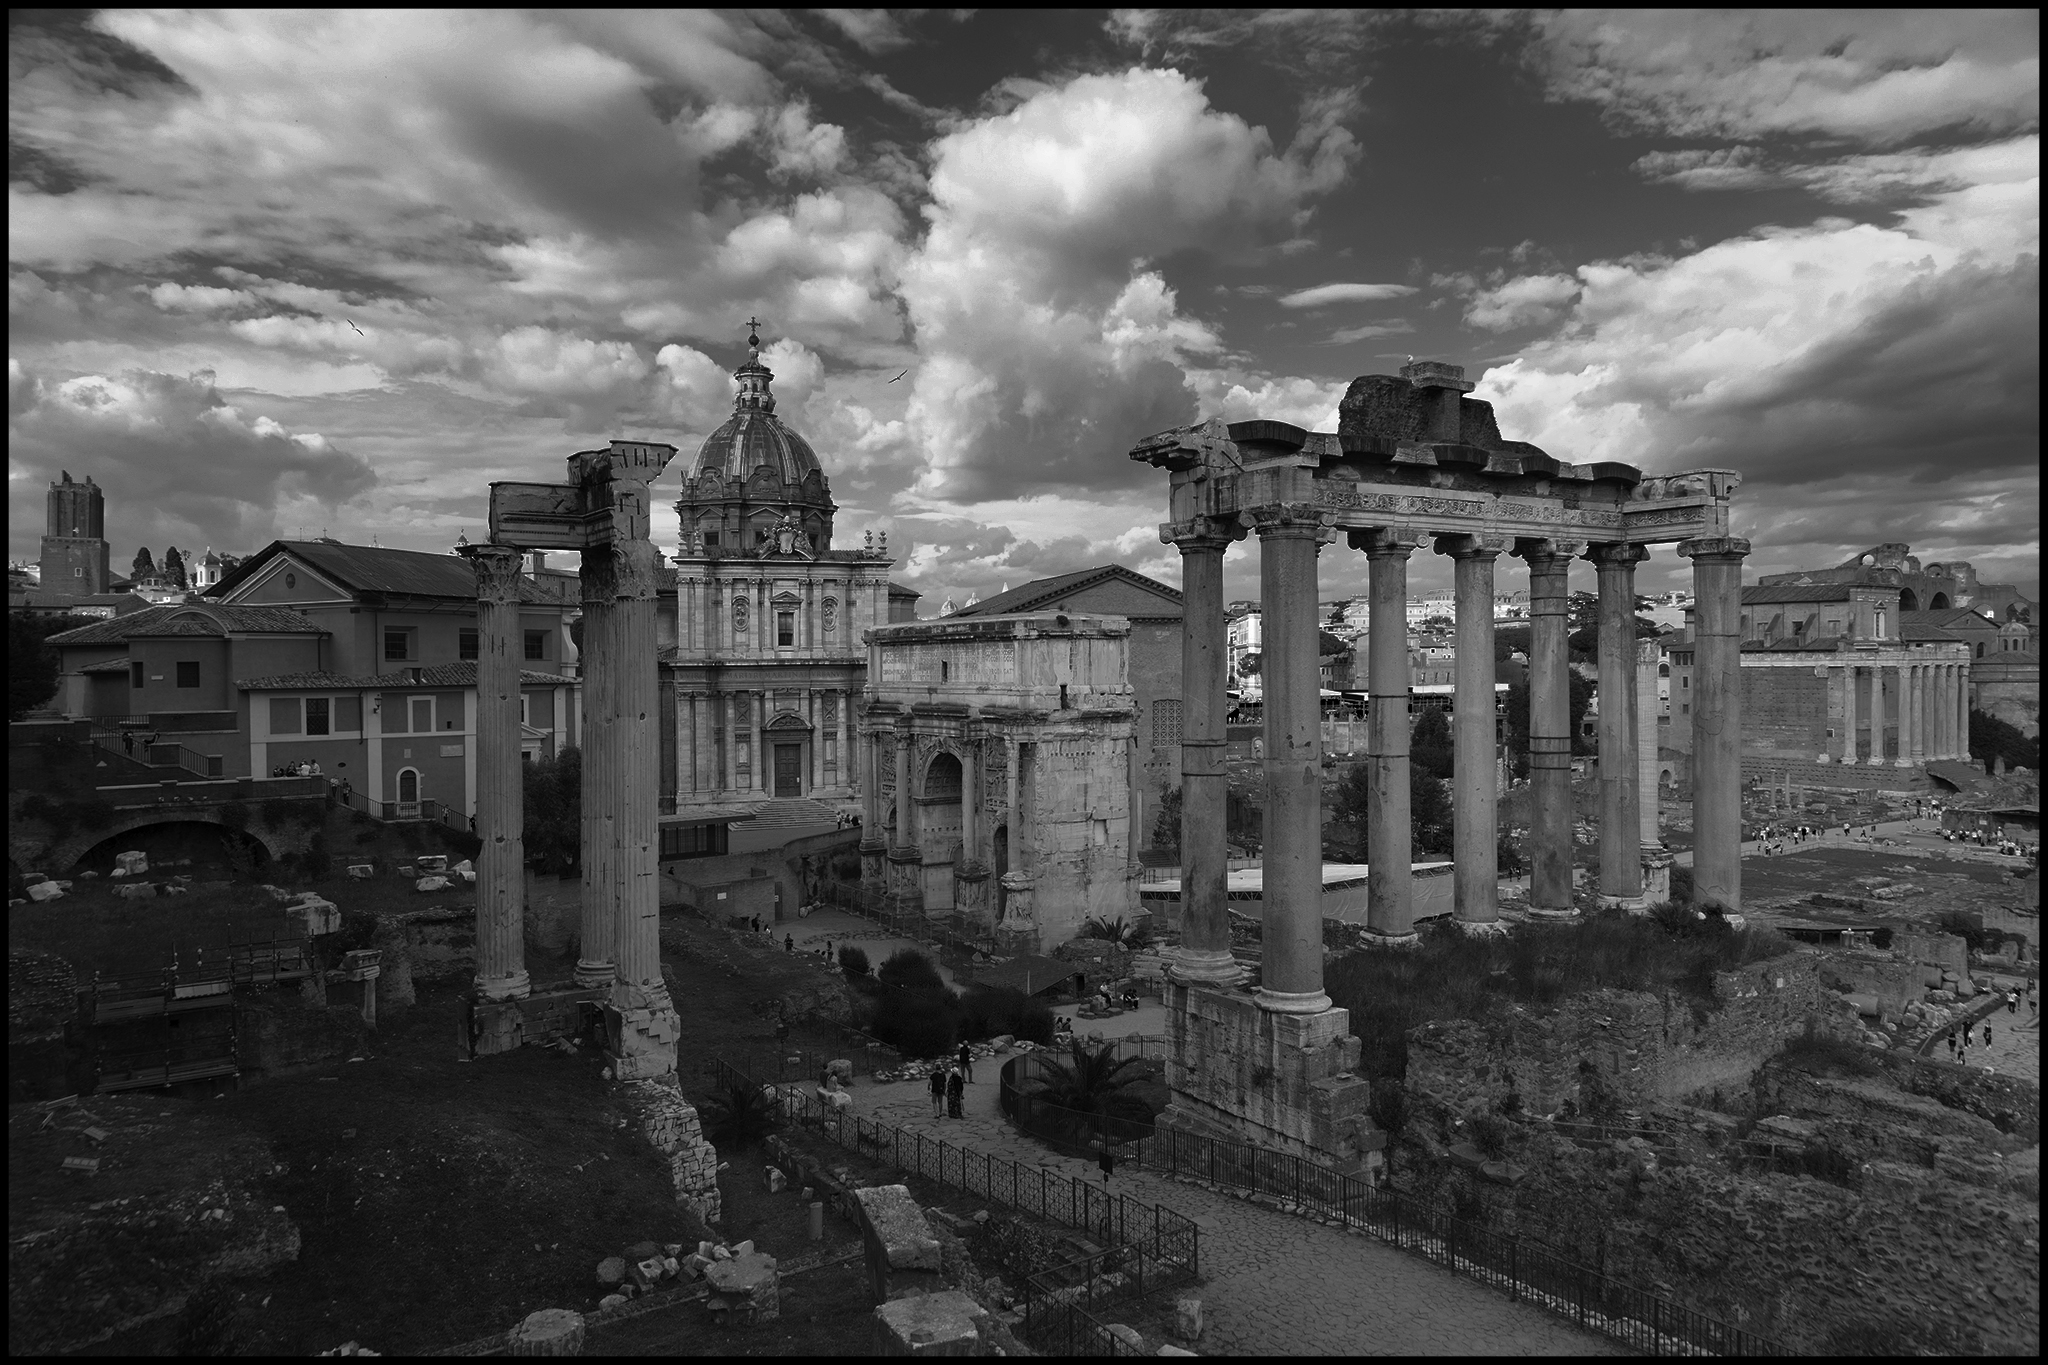 2 June 2019 - Roman Forum, Rome IT